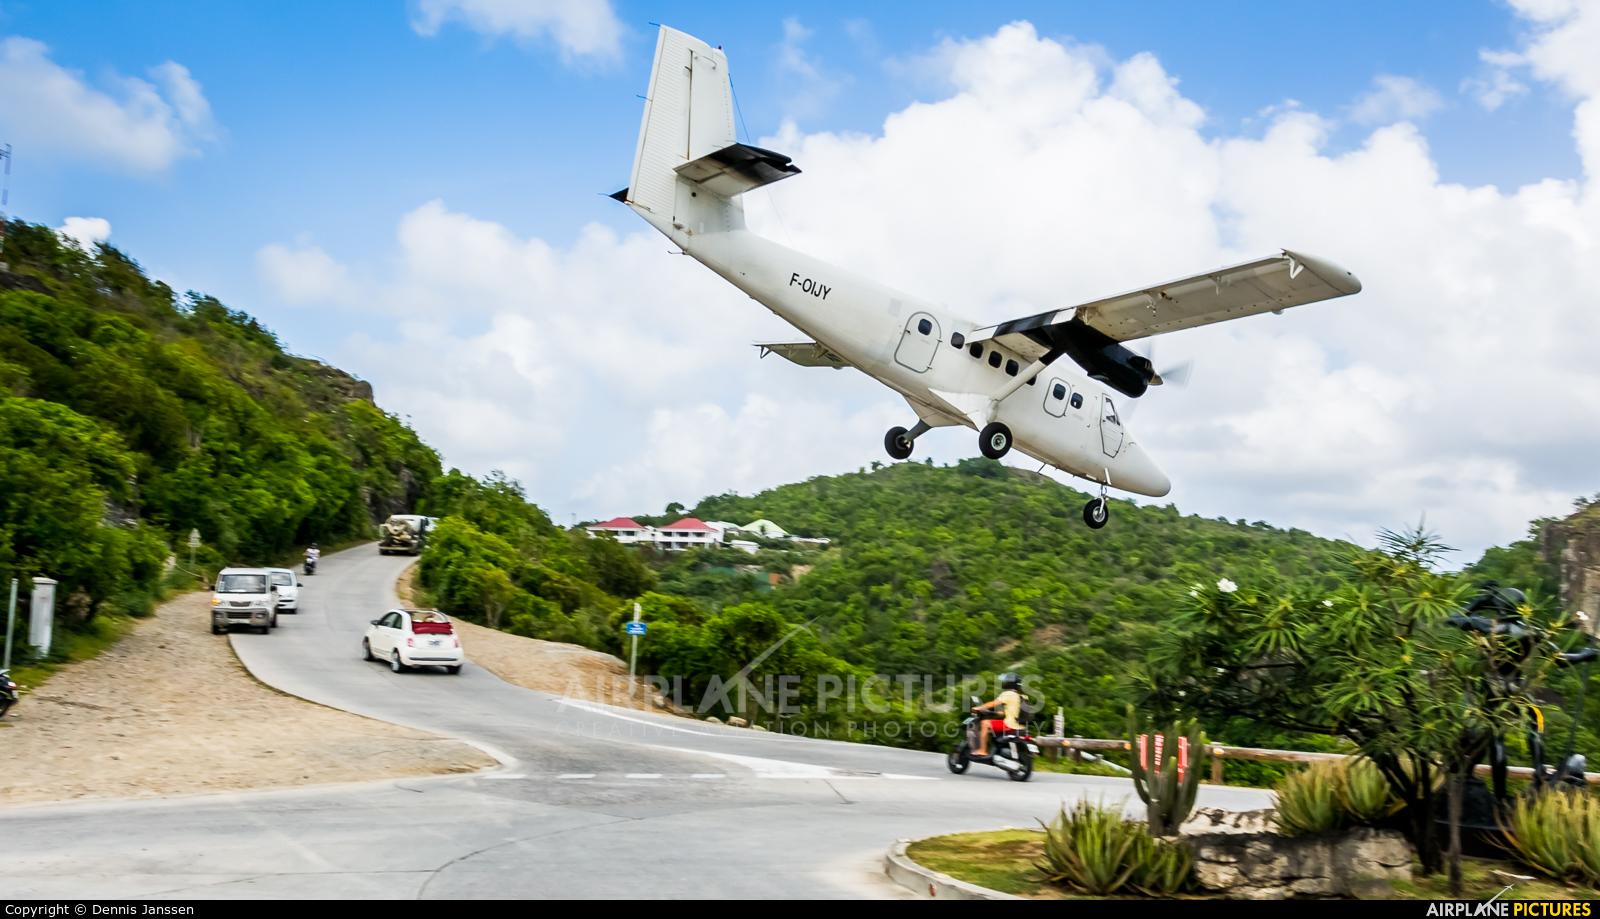 Air Antilles Express F-OIJY aircraft at Saint-Barthélemy - Gustaf III